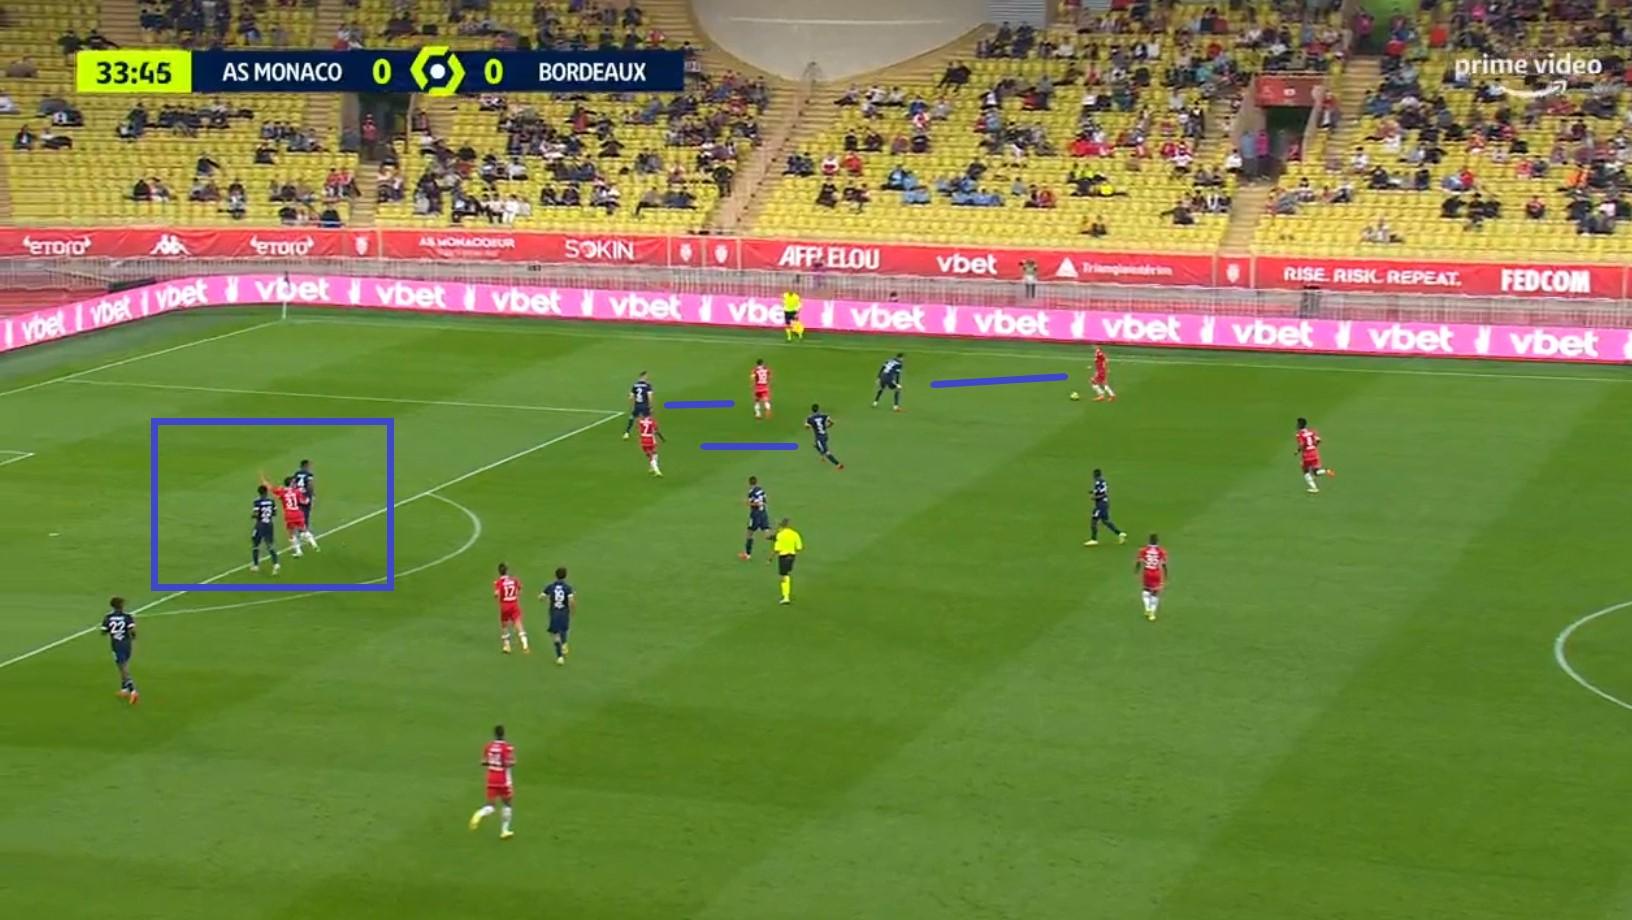 Monaco2_7.jpg (269 KB)